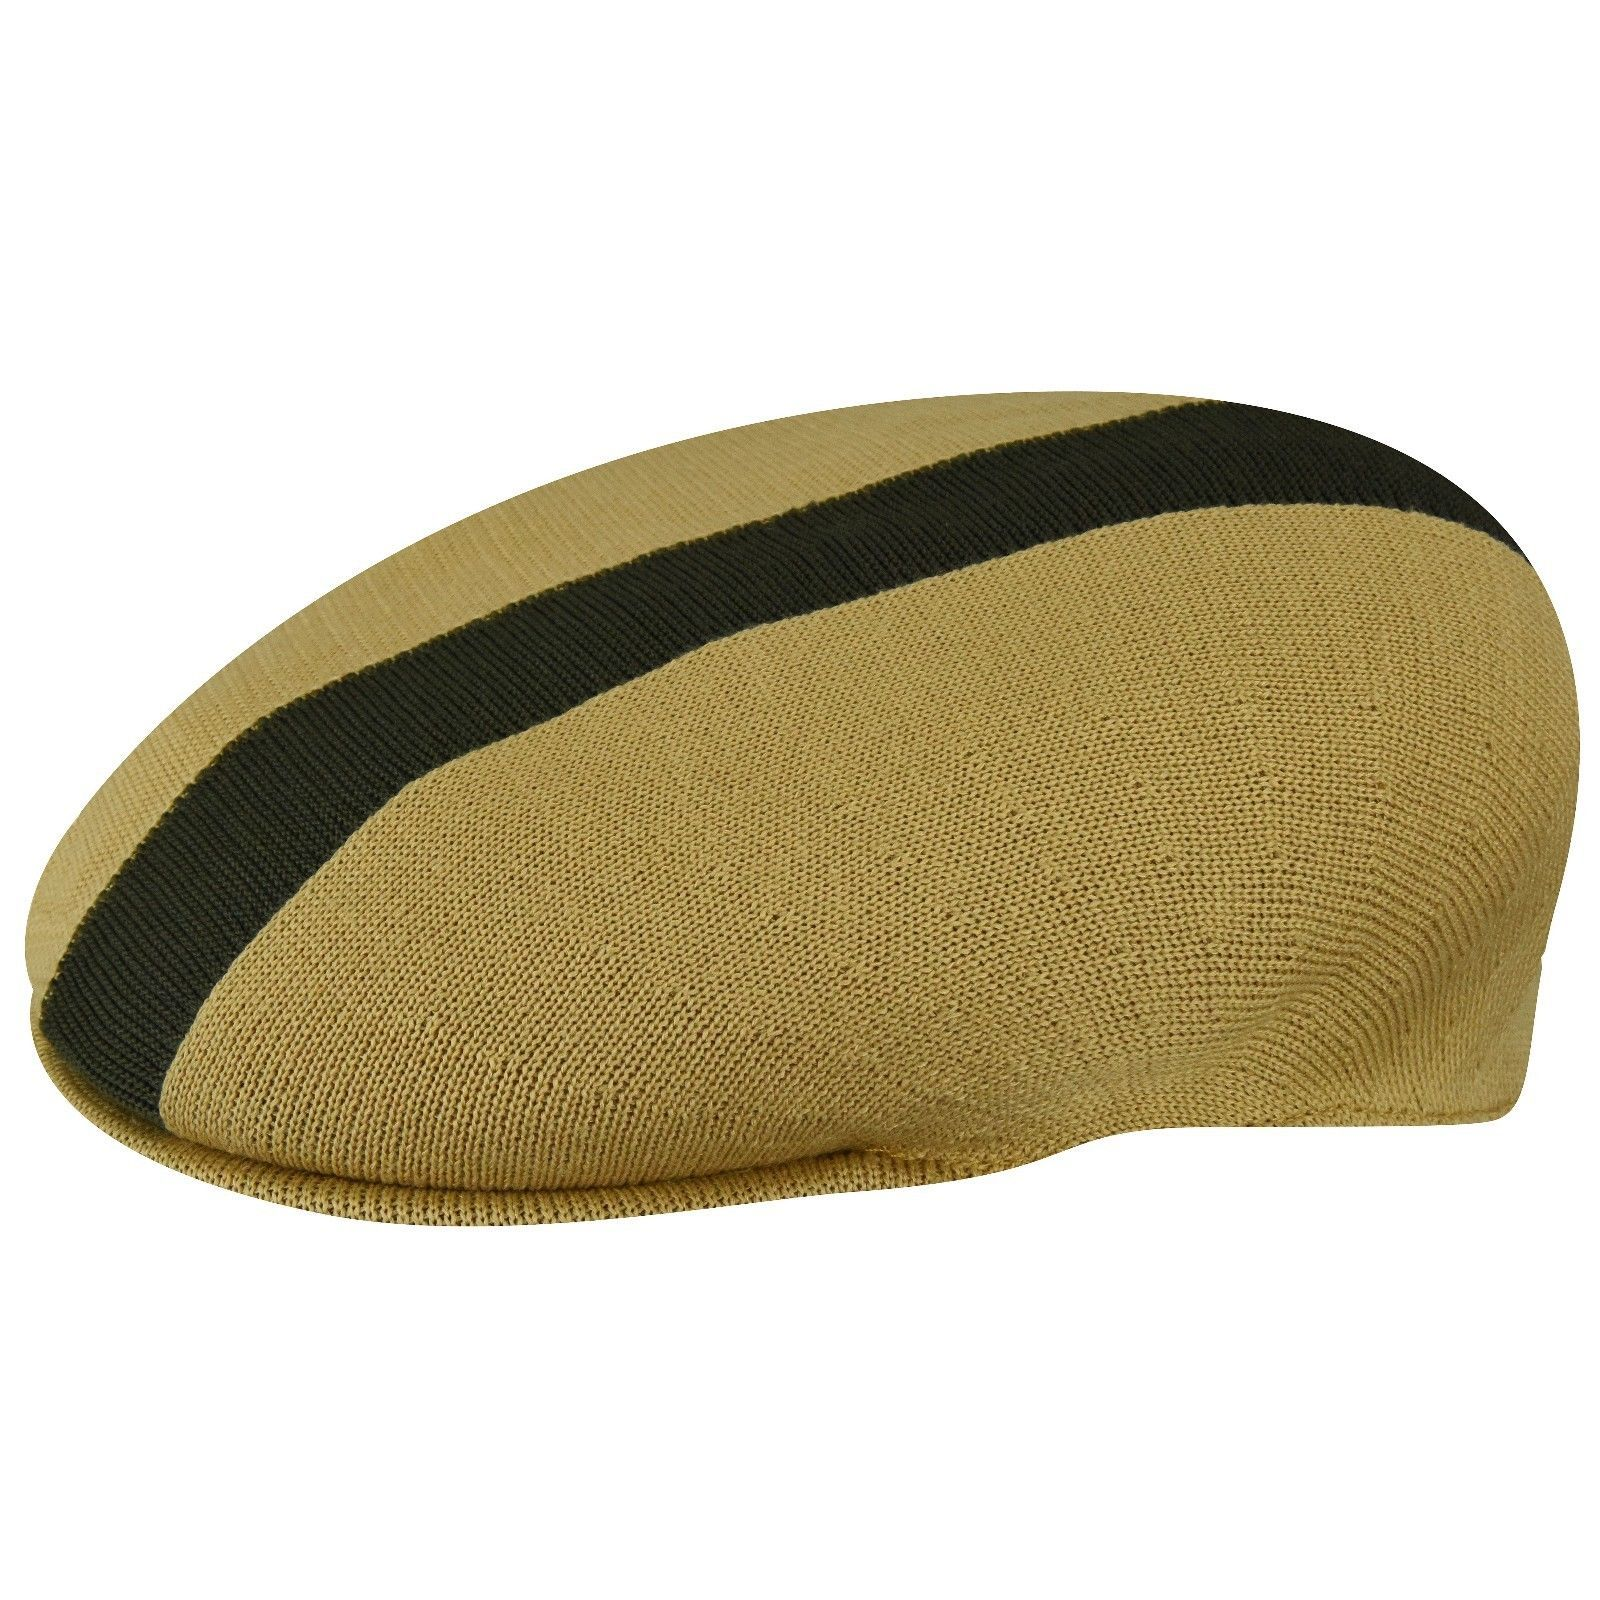 Kangol headwear mens hat k3132ht path stripe 504 flat cap